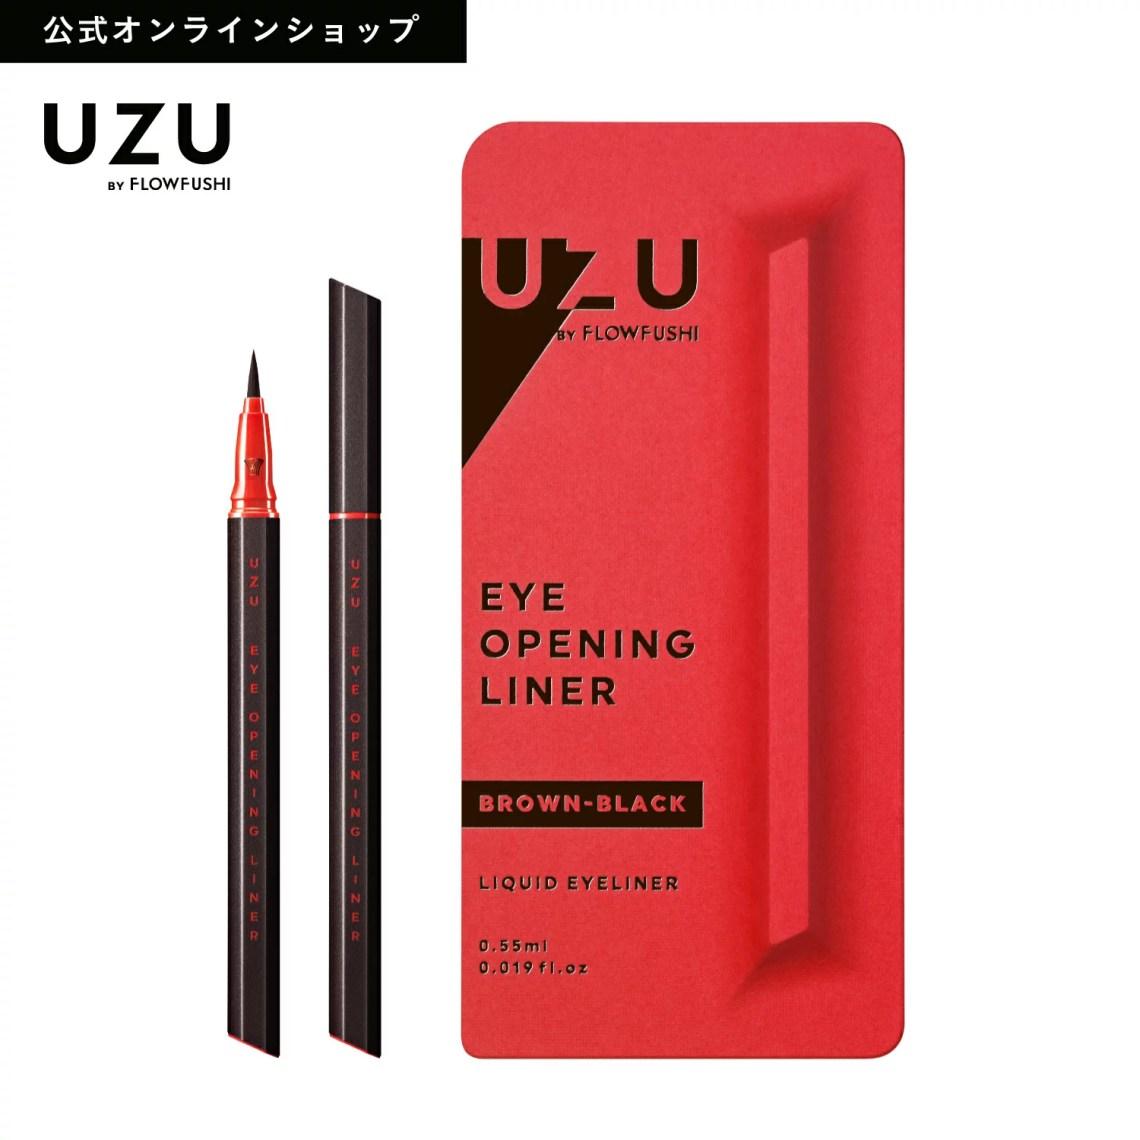 【UZU BY FLOWFUSHI公式】 アイオープニングライナー BROWN-BLACK(ブラウン